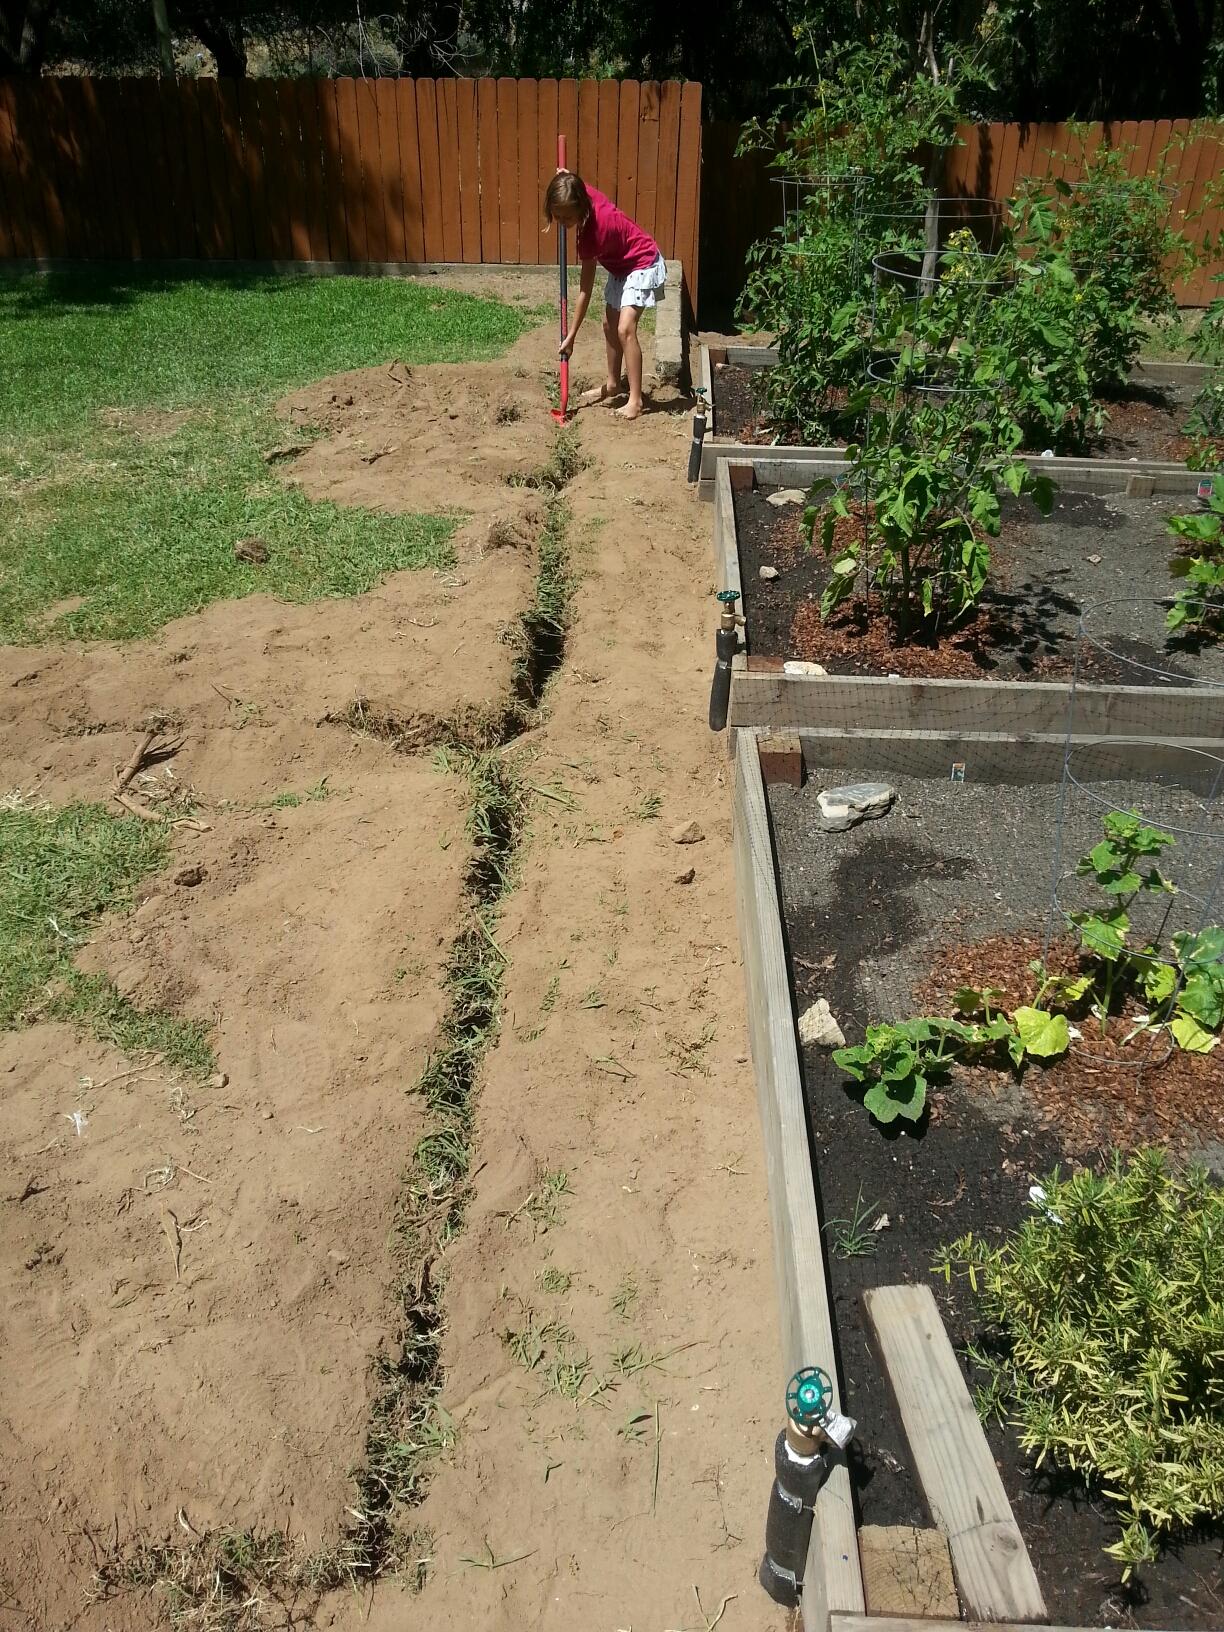 Fair Oaks, CA - Fair Oaks plumbing repair installation of 6 new hose bibs and 250 feet of new irrigation line